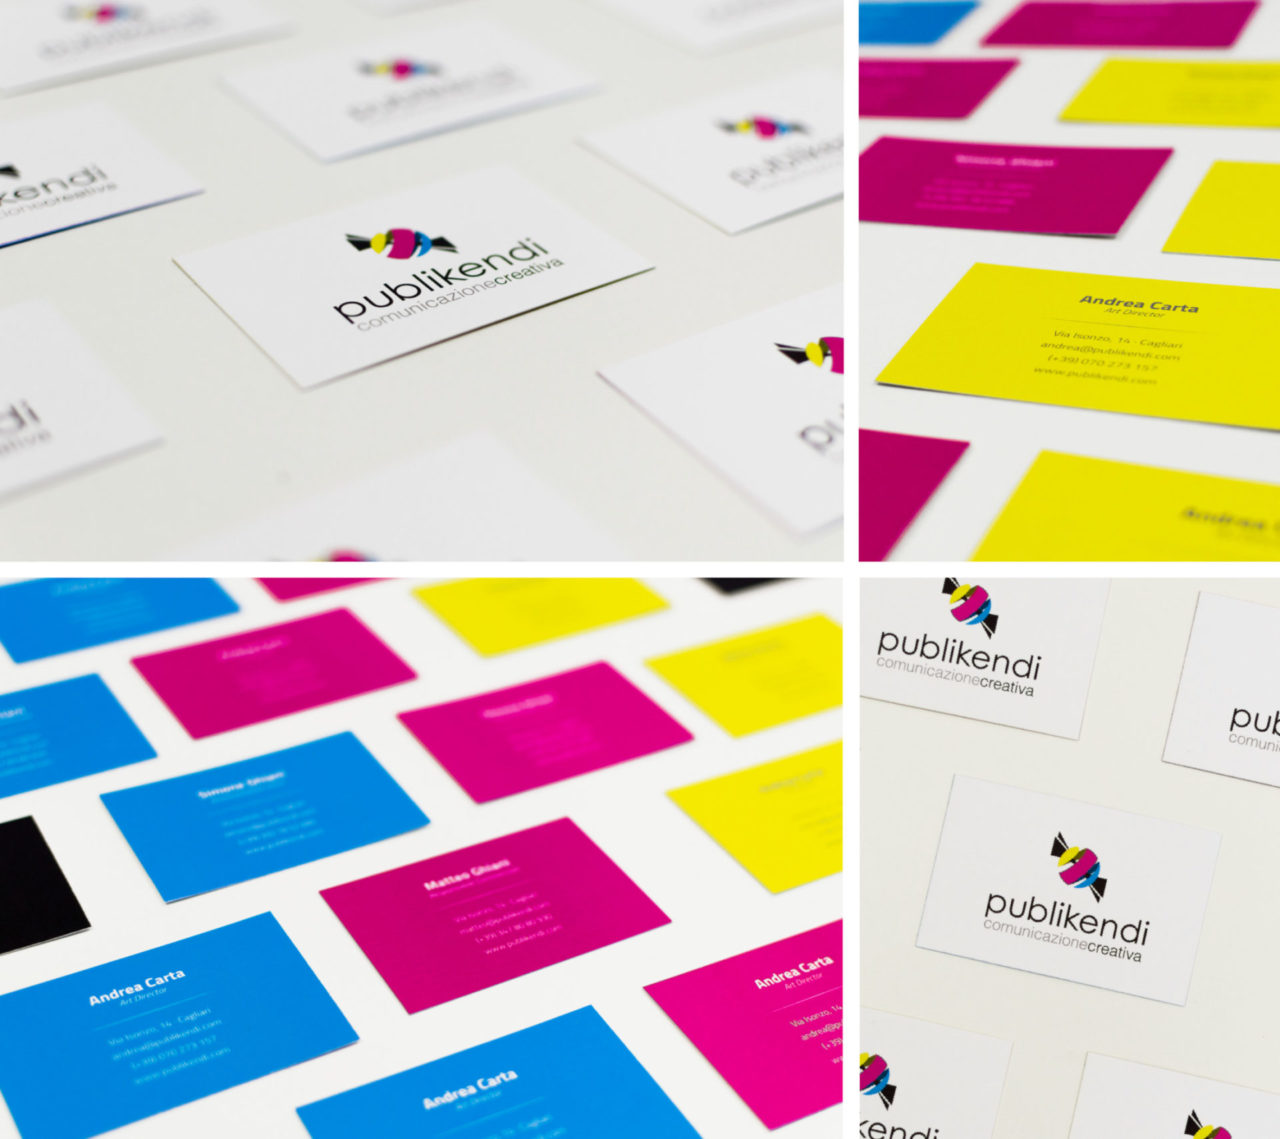 Publikendi - Andrea Carta - Design